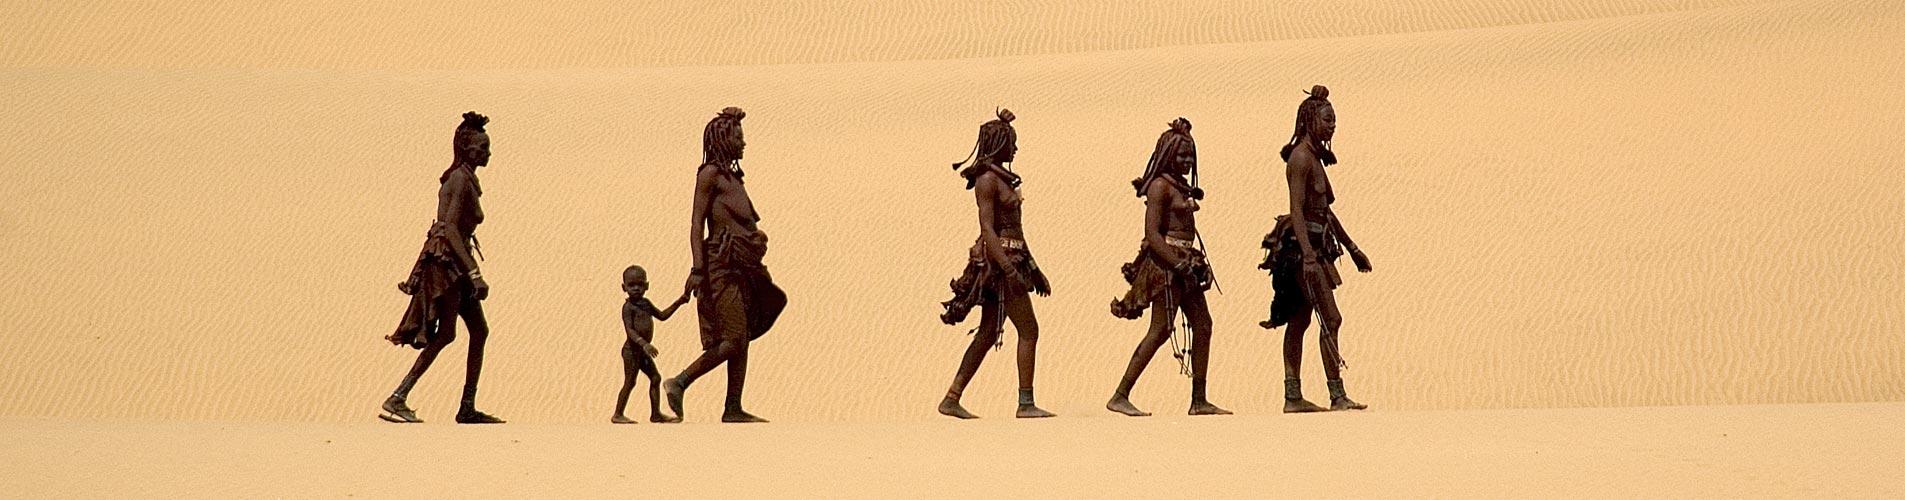 Namibia Safaris Himba Tribe Serra Cafema